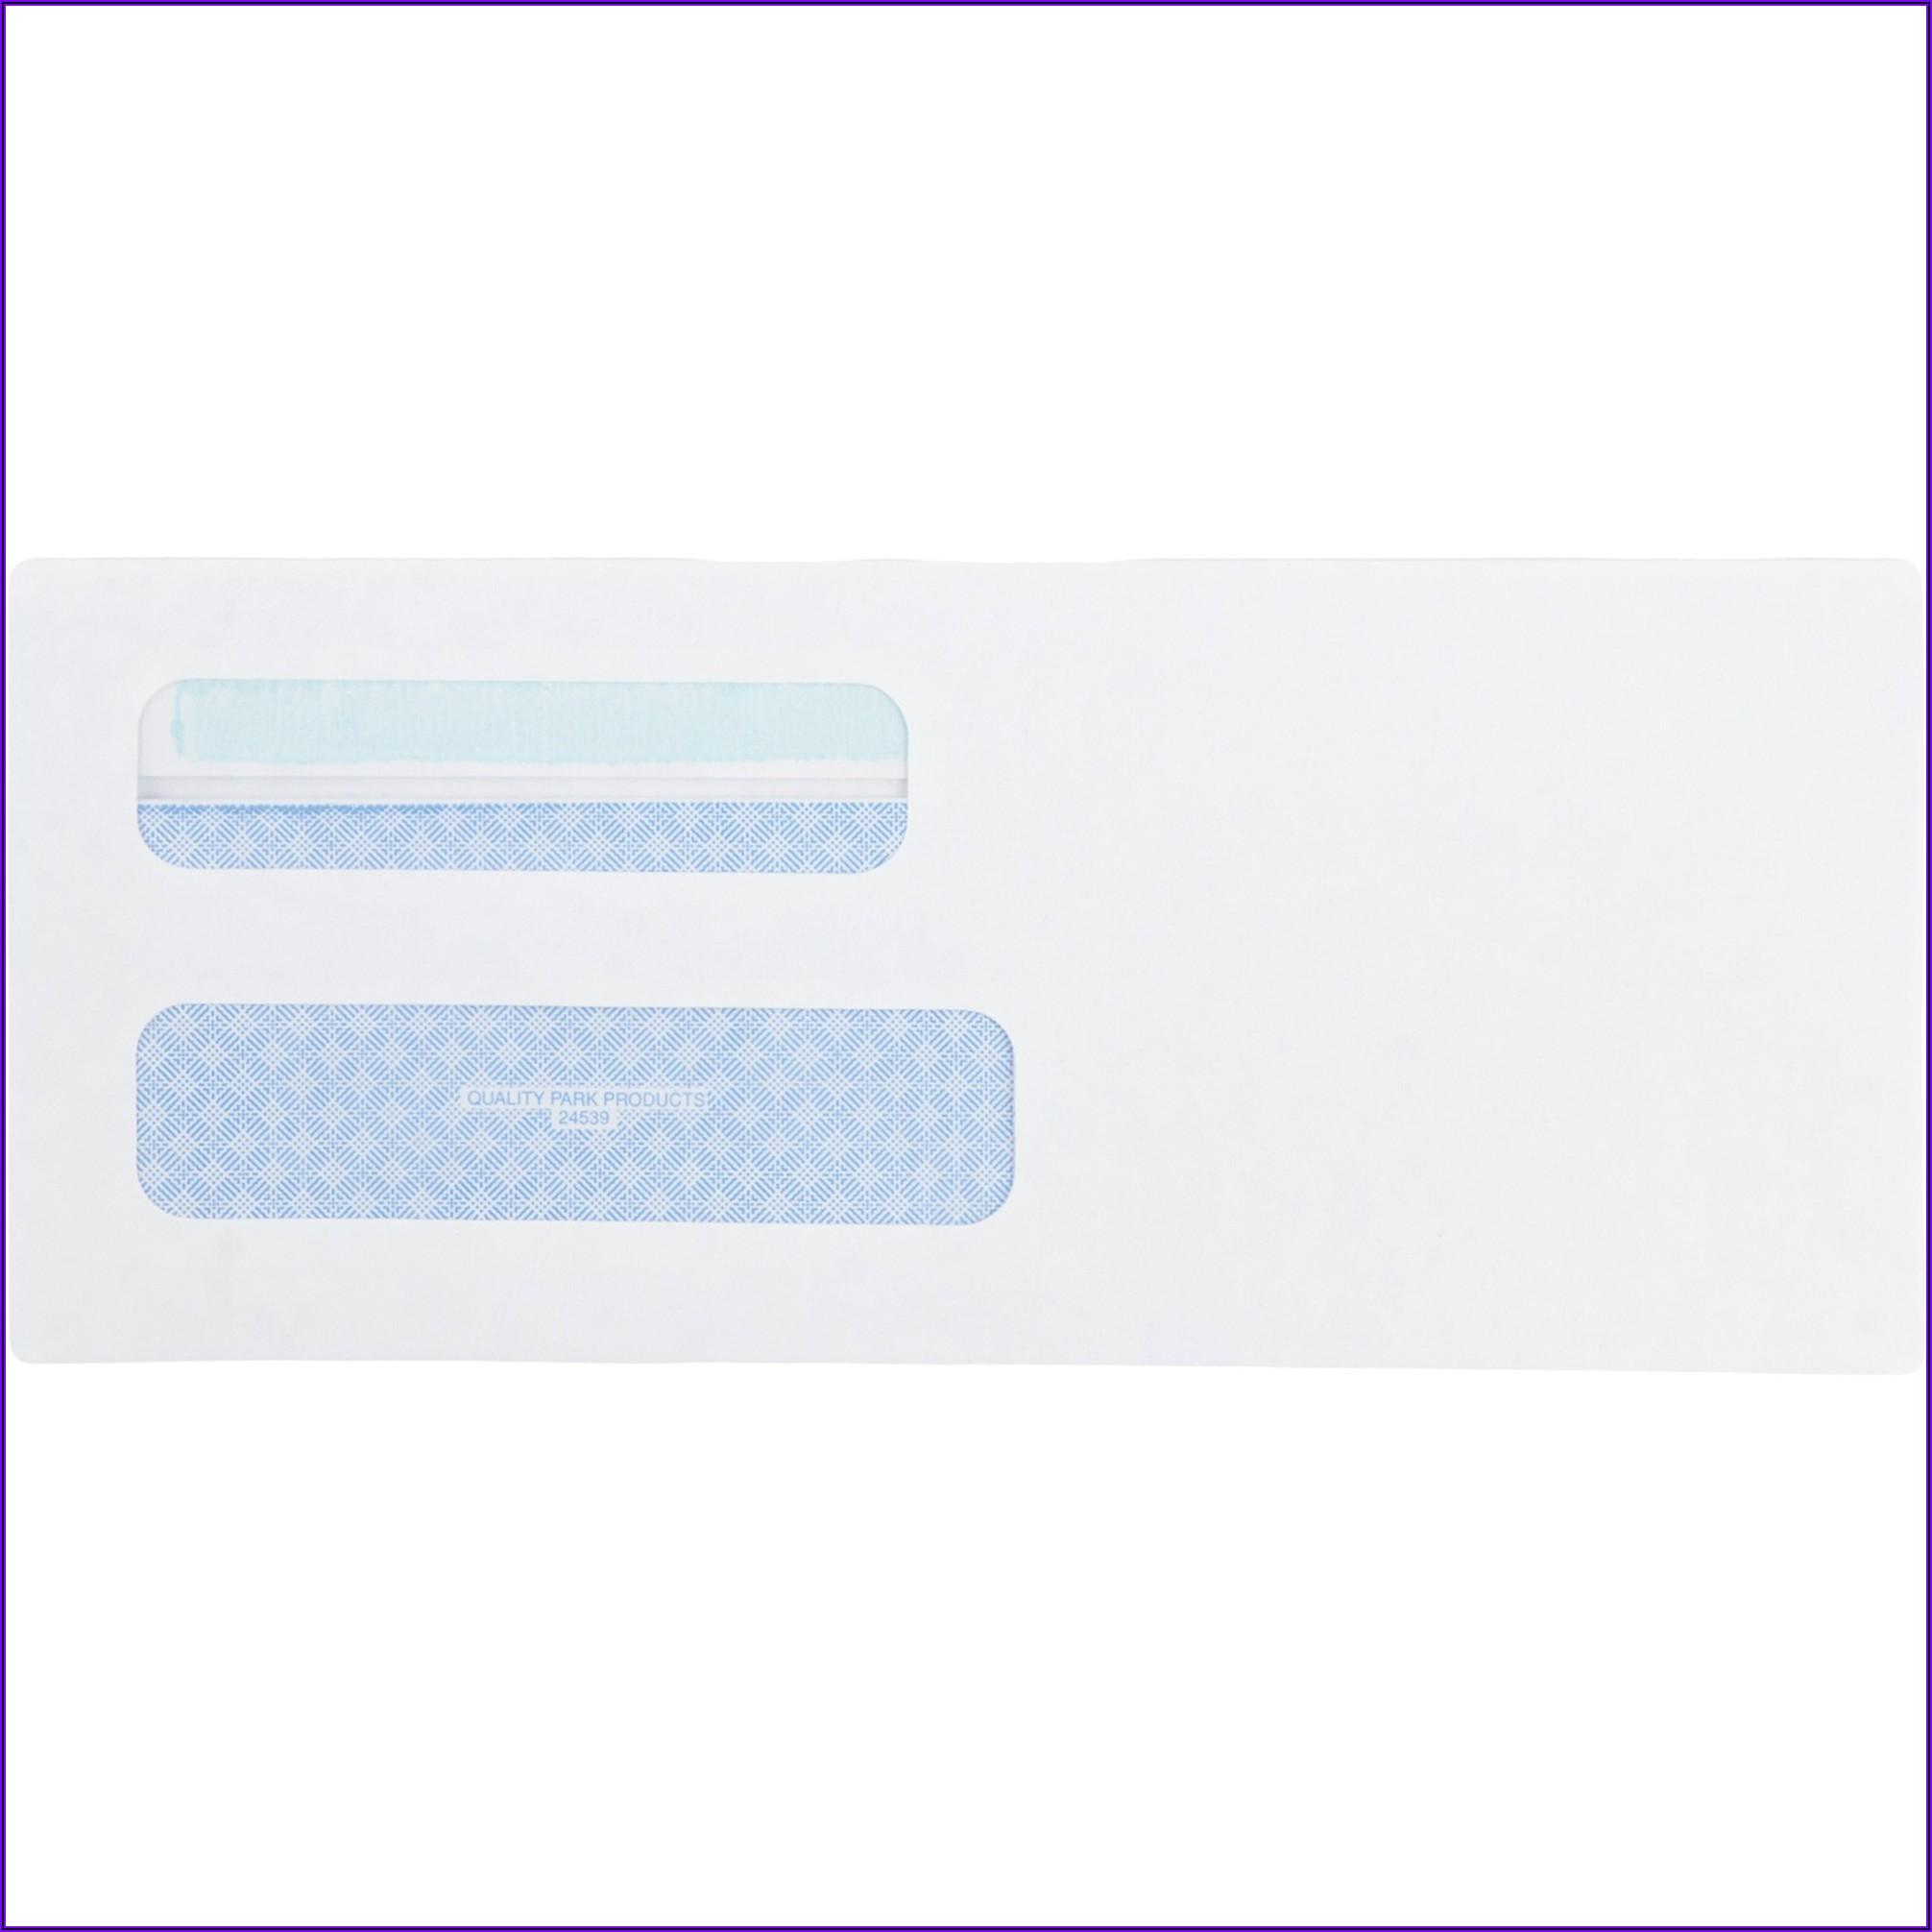 Quality Park Double Window Redi Seal Envelopes